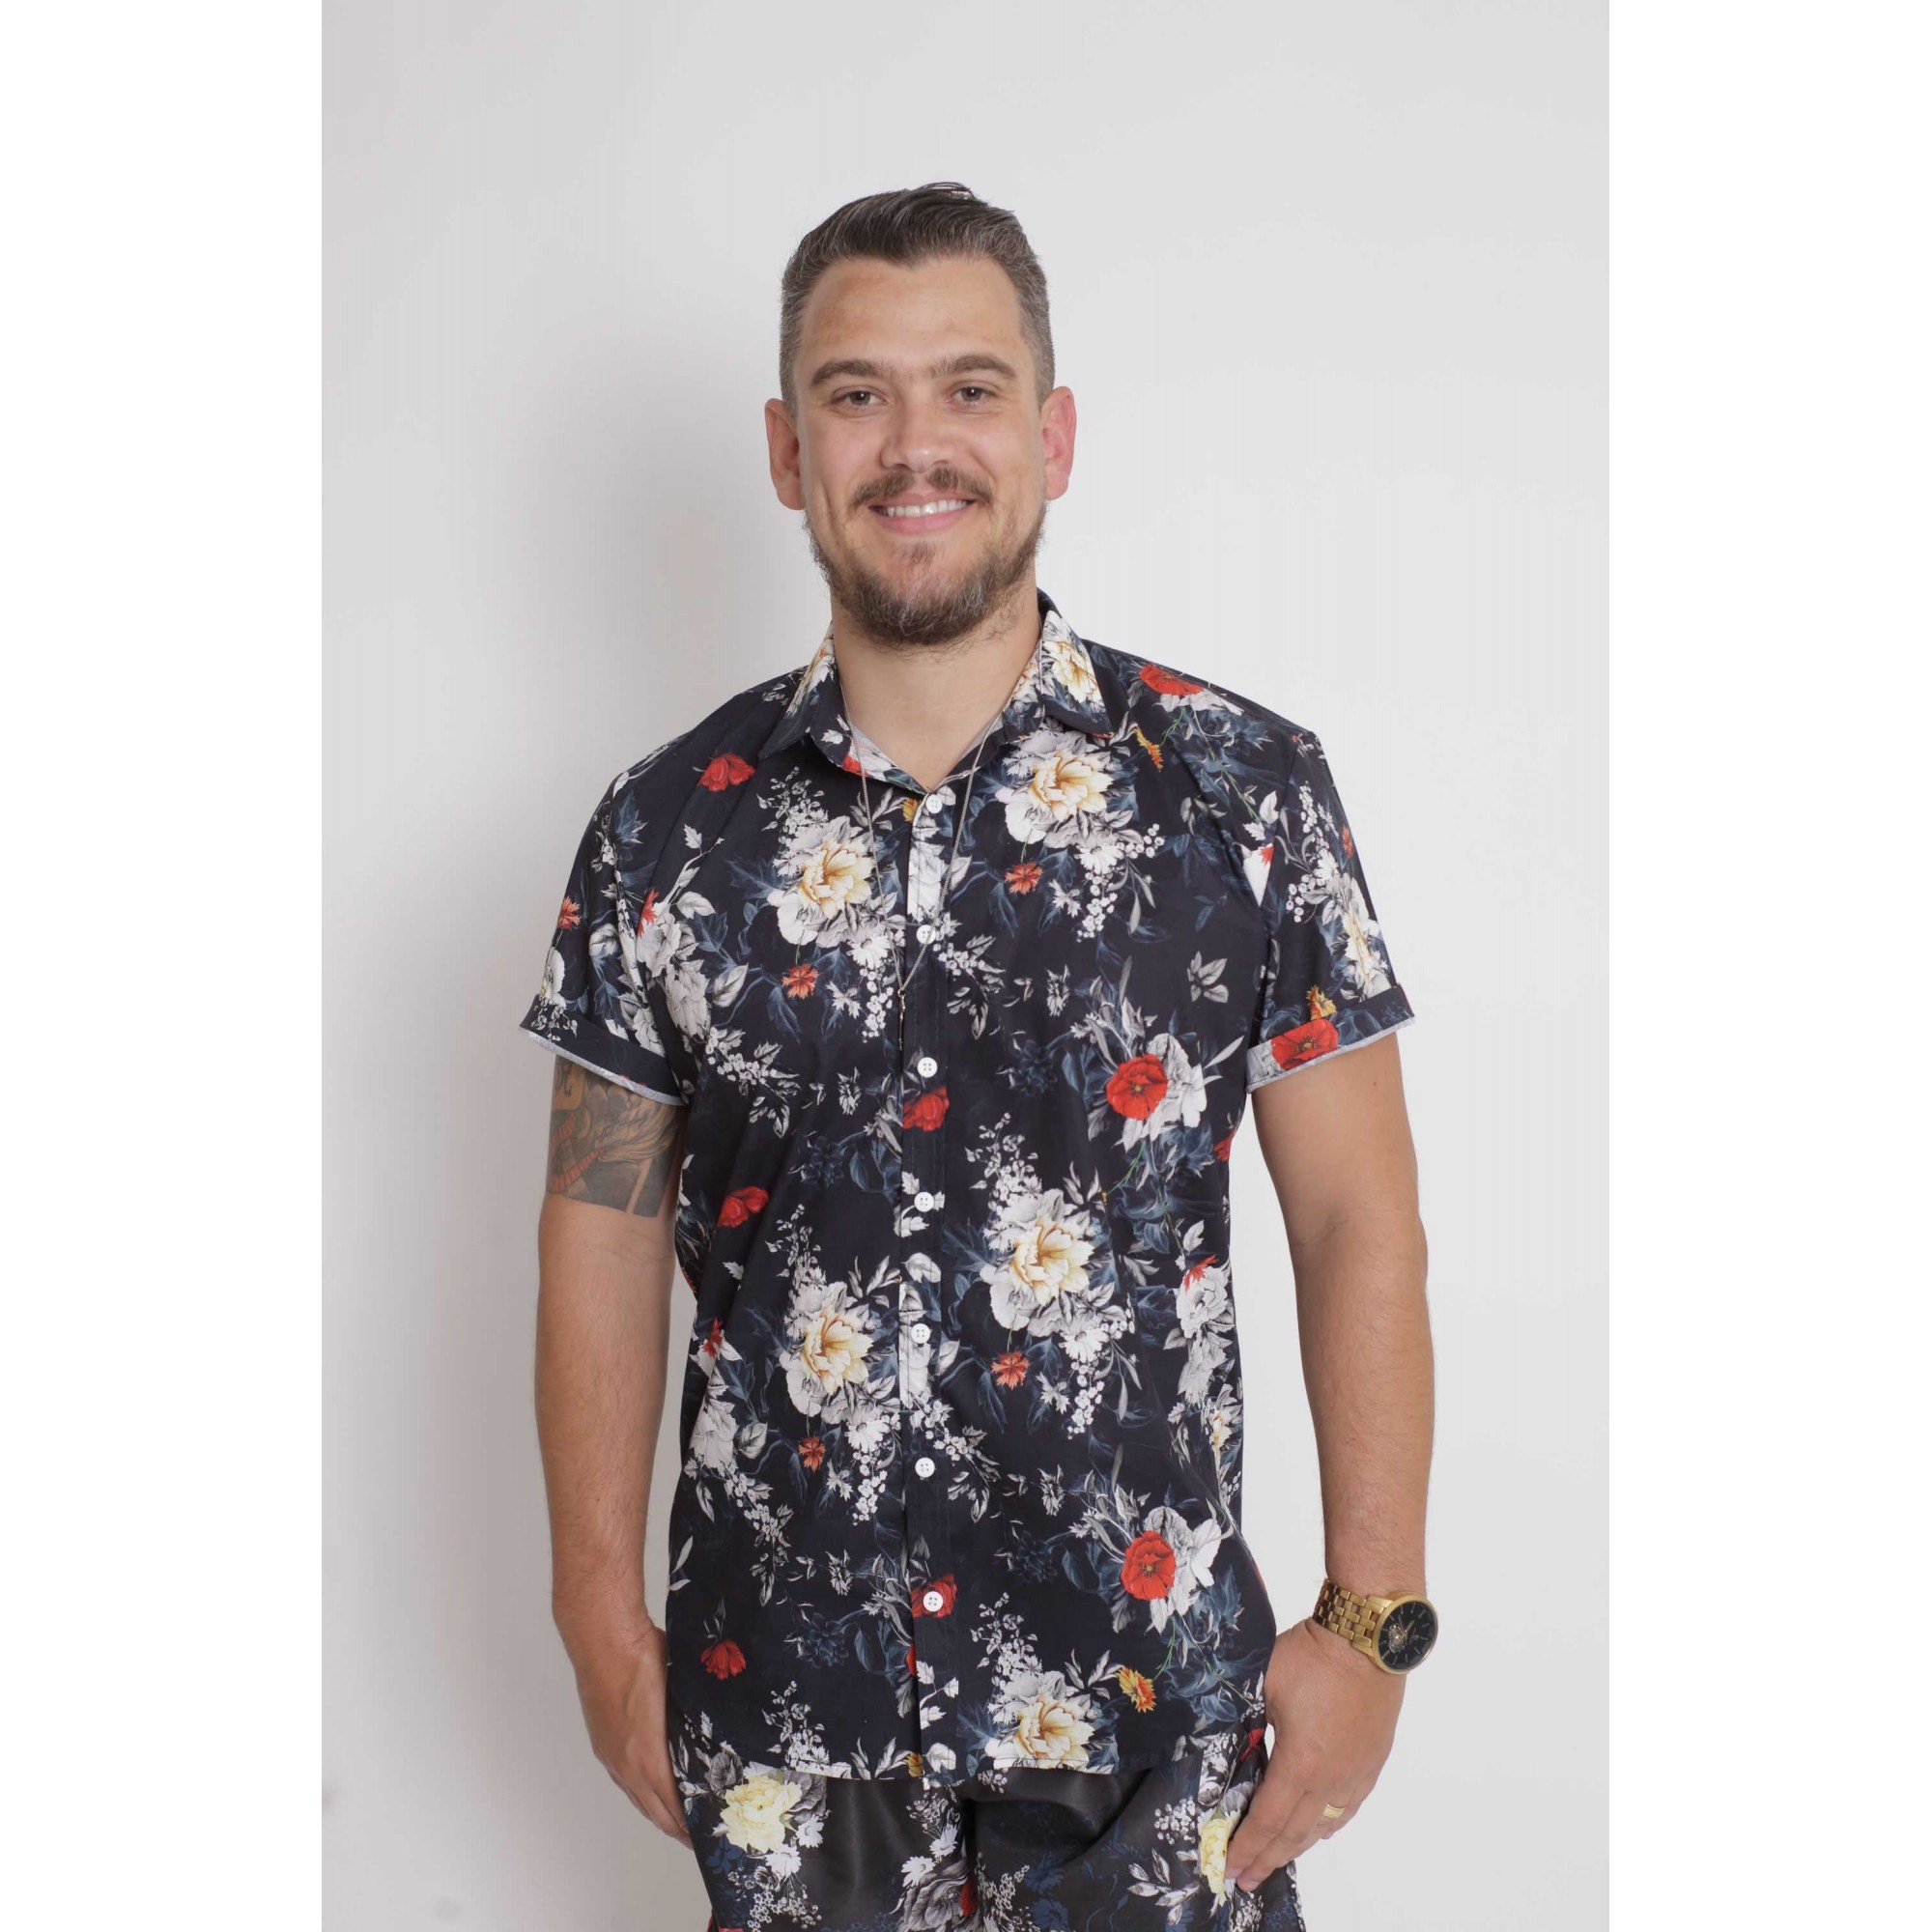 Camisa Social Manga Curta Preta Floral  - Heitor Fashion Brazil